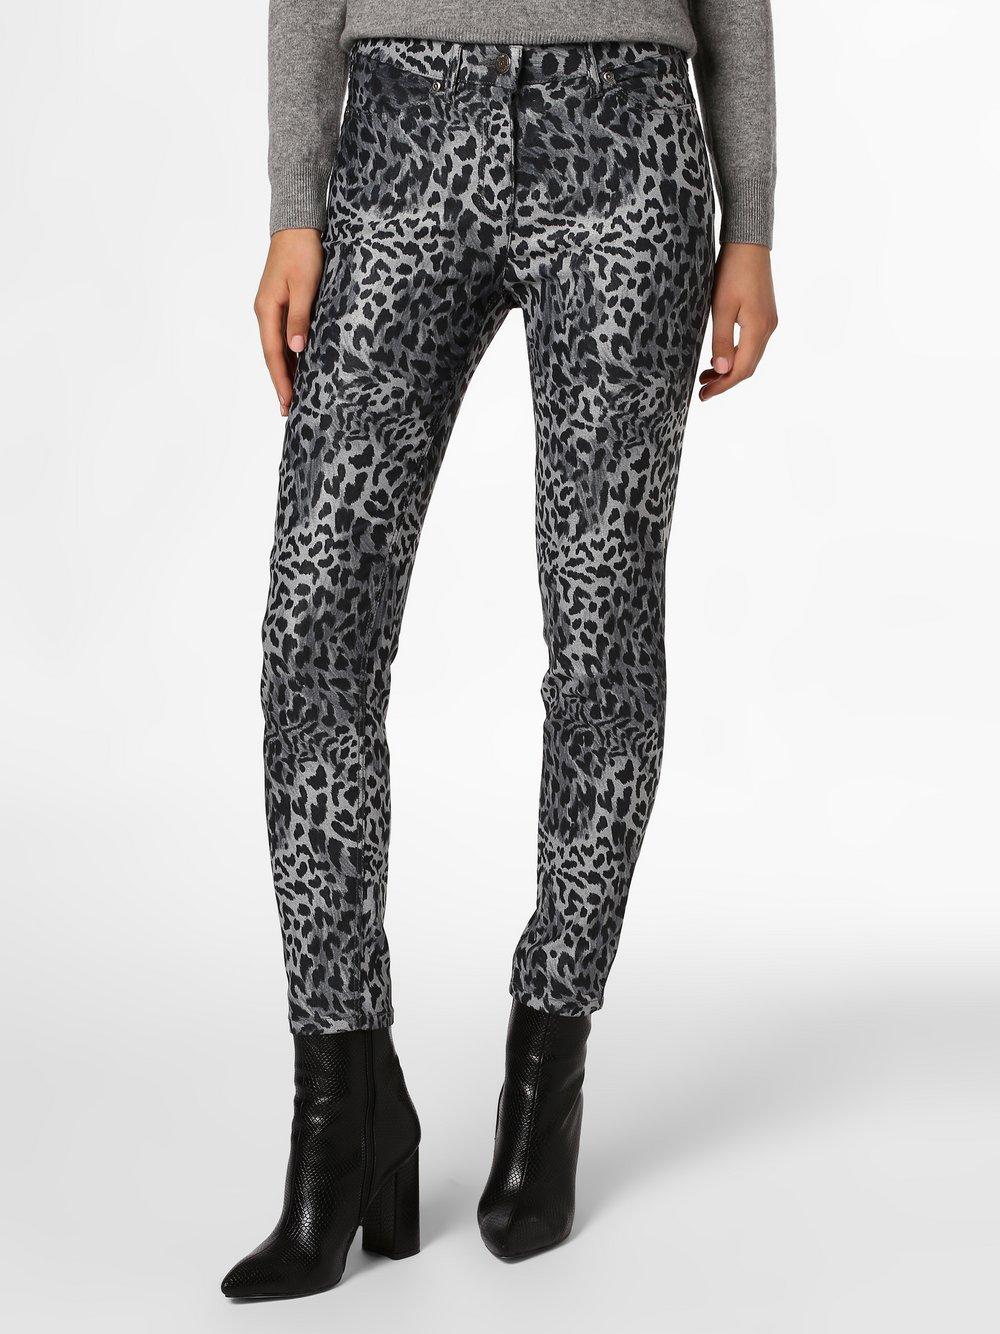 TONI – Spodnie damskie, szary Van Graaf 446330-0001-00460